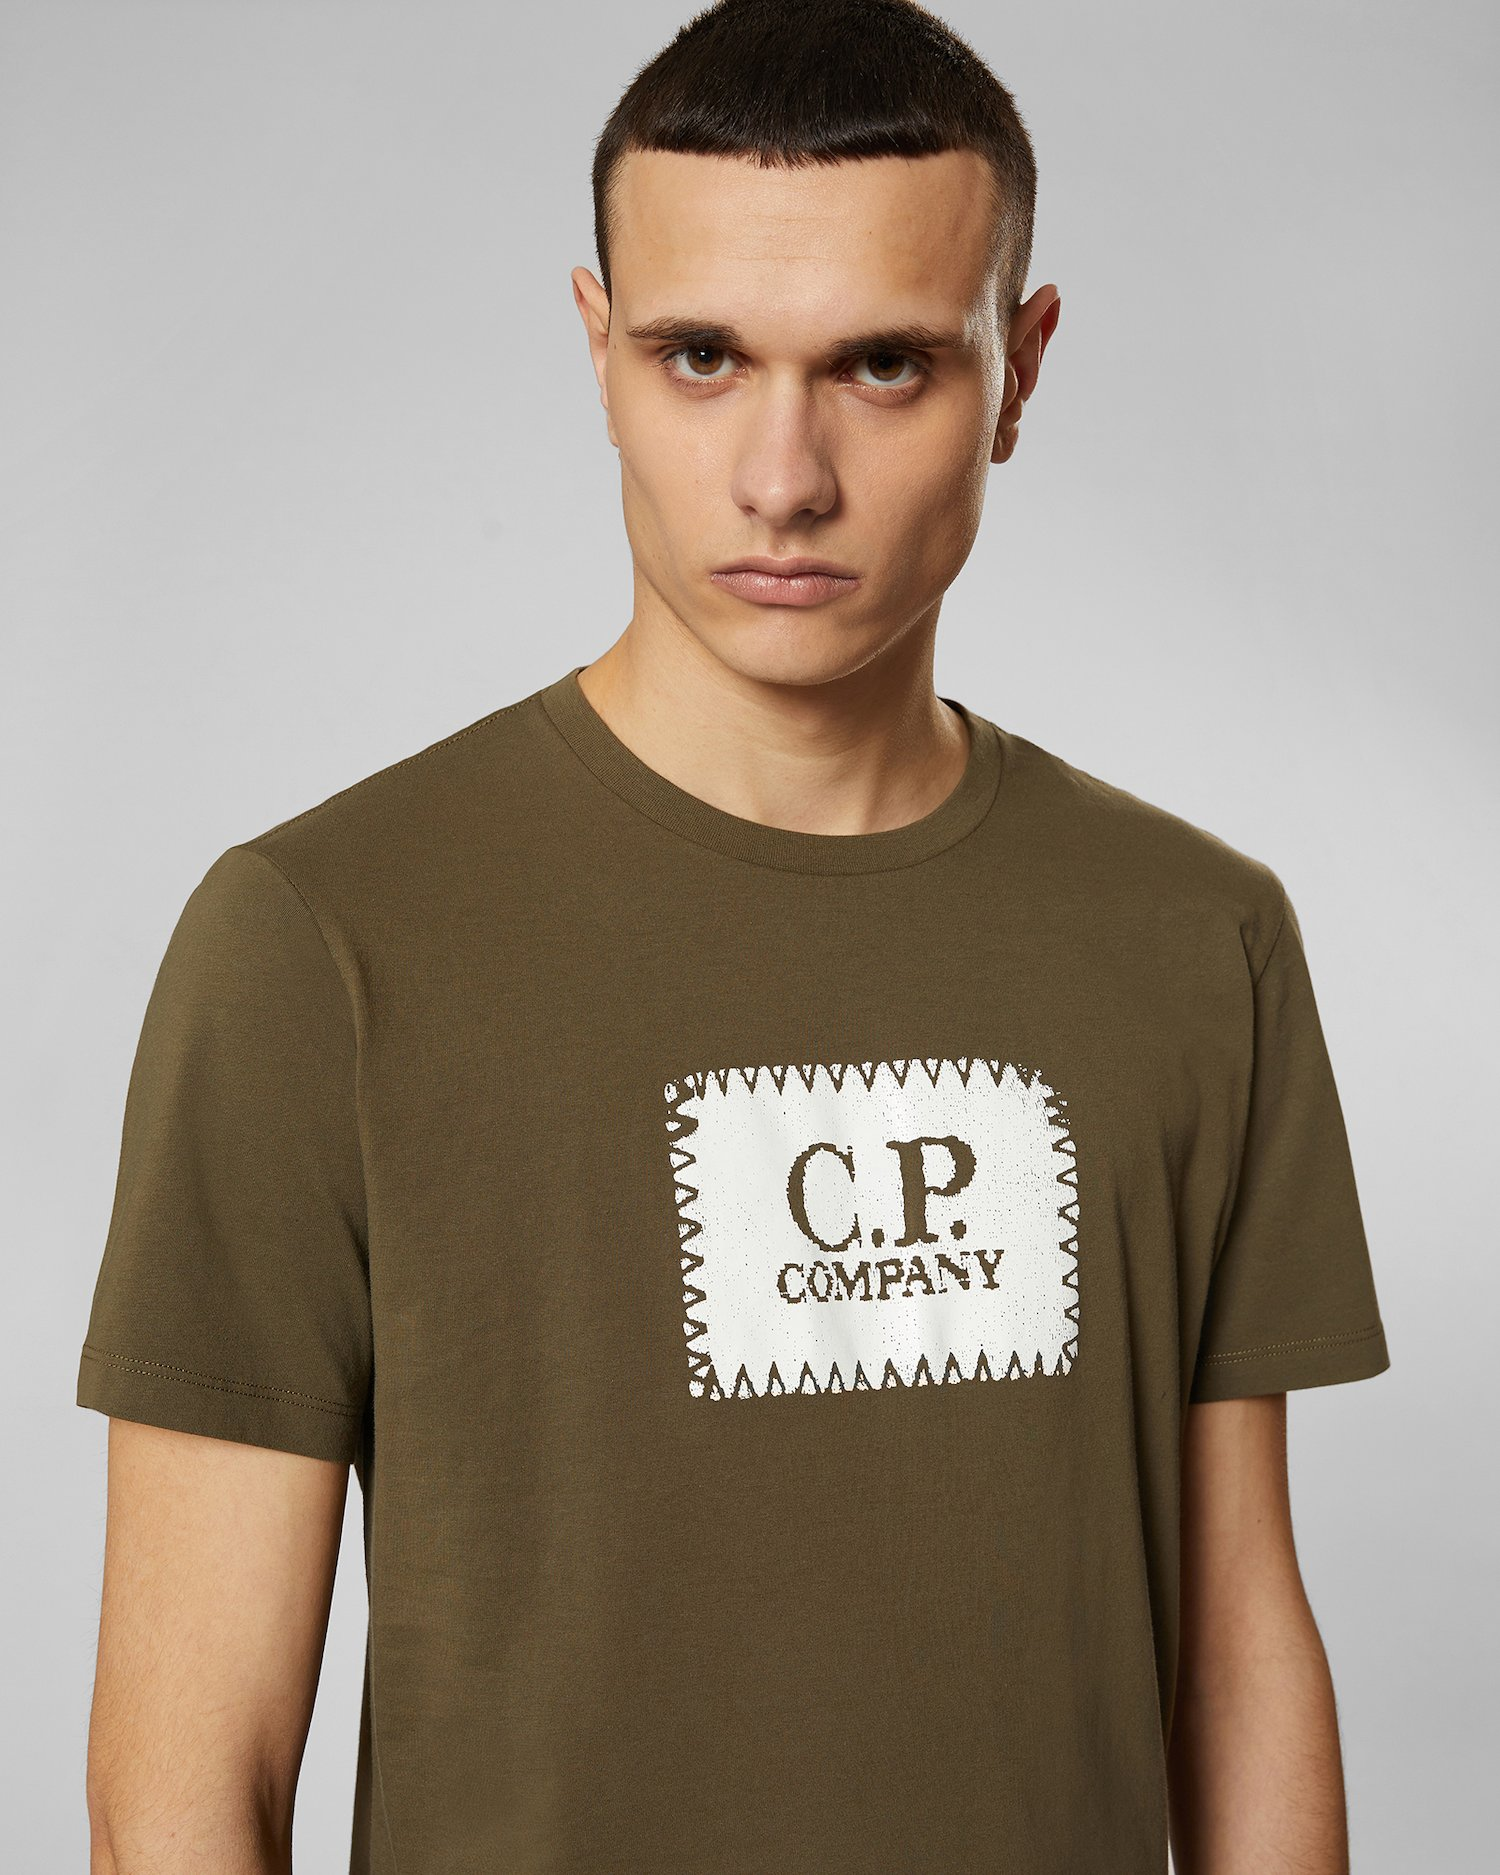 T C Crew Label Company Print 301 Beech p Online Shirt In Jersey nHATIqH